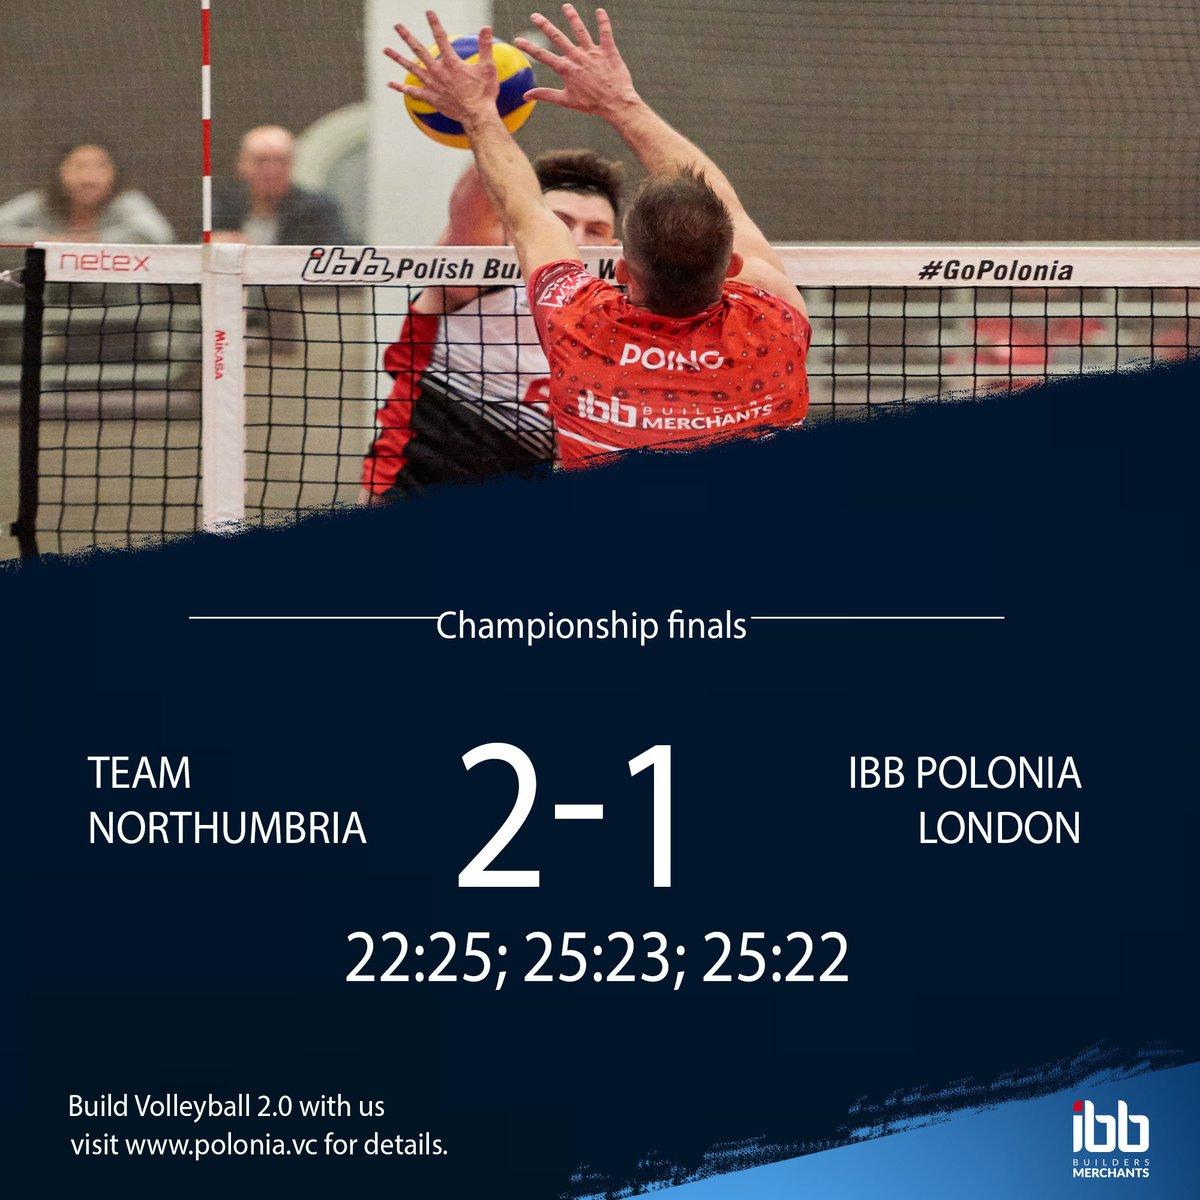 Vballengland Championship Finals St Leg Teamnorthumbria Ibb Polonia London   Gopolonia Ilikeibb Watch Live On Bbcsport